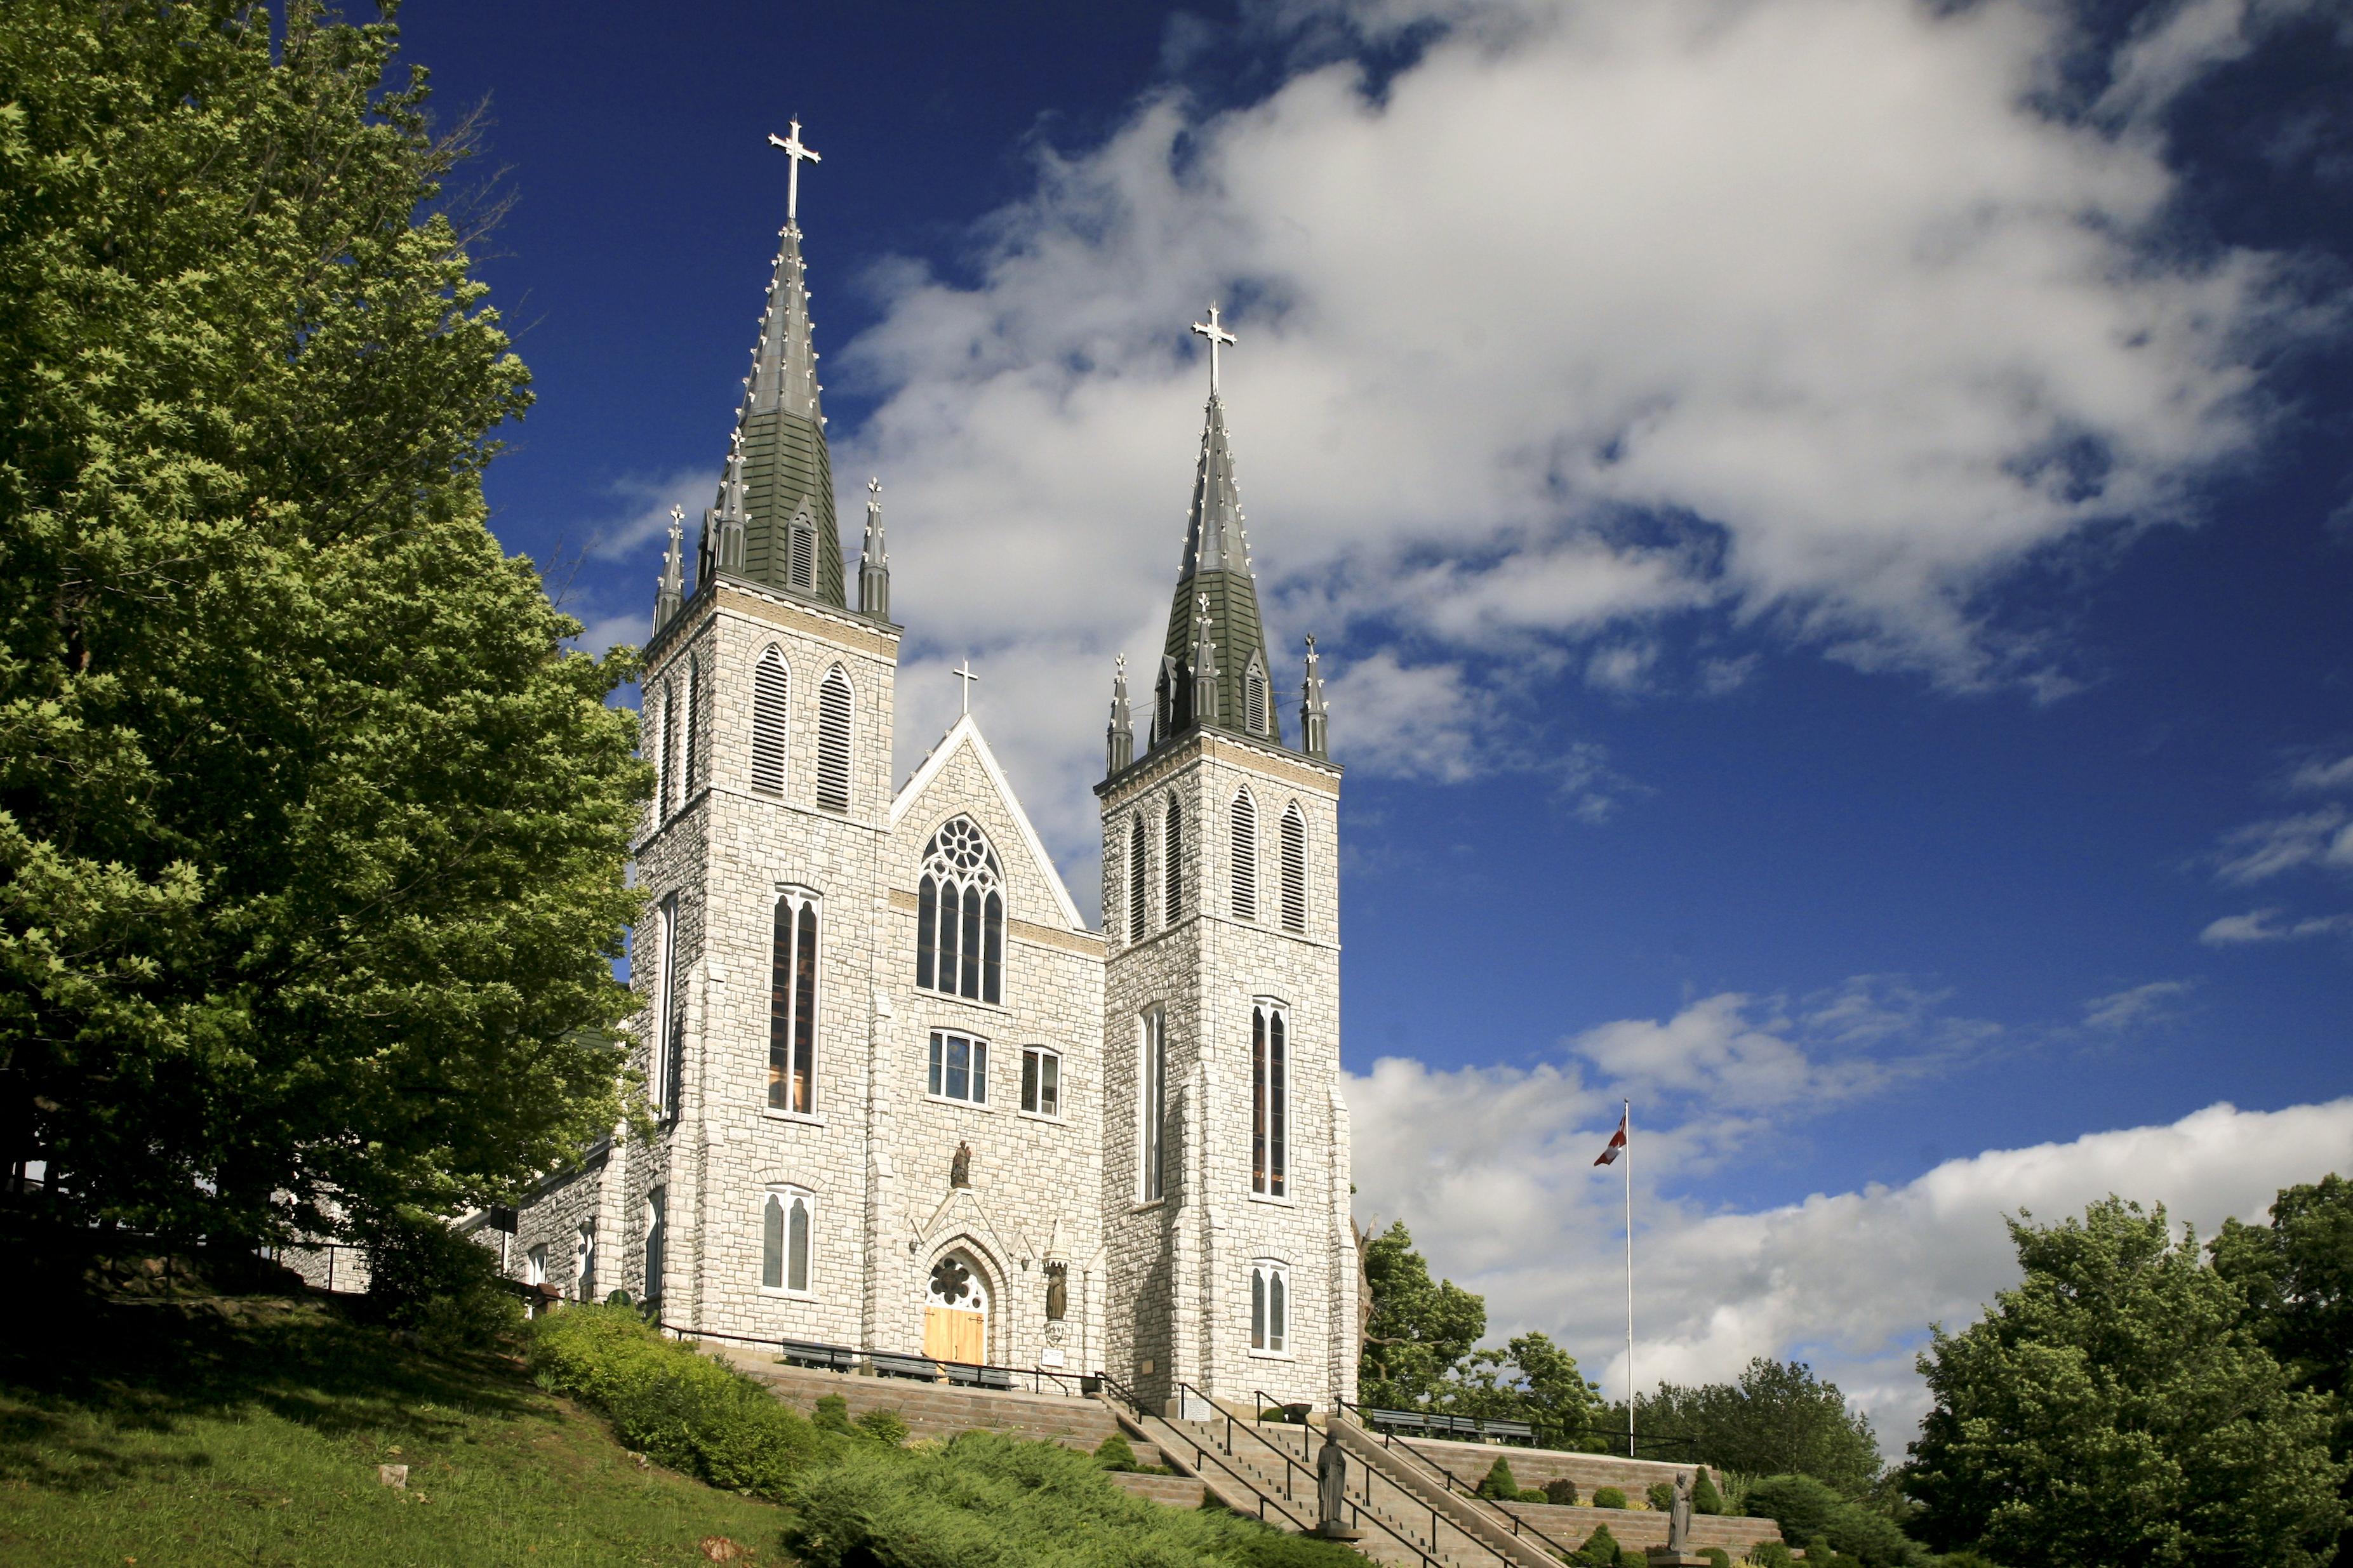 Martyr's Shrine, Midland, Canada